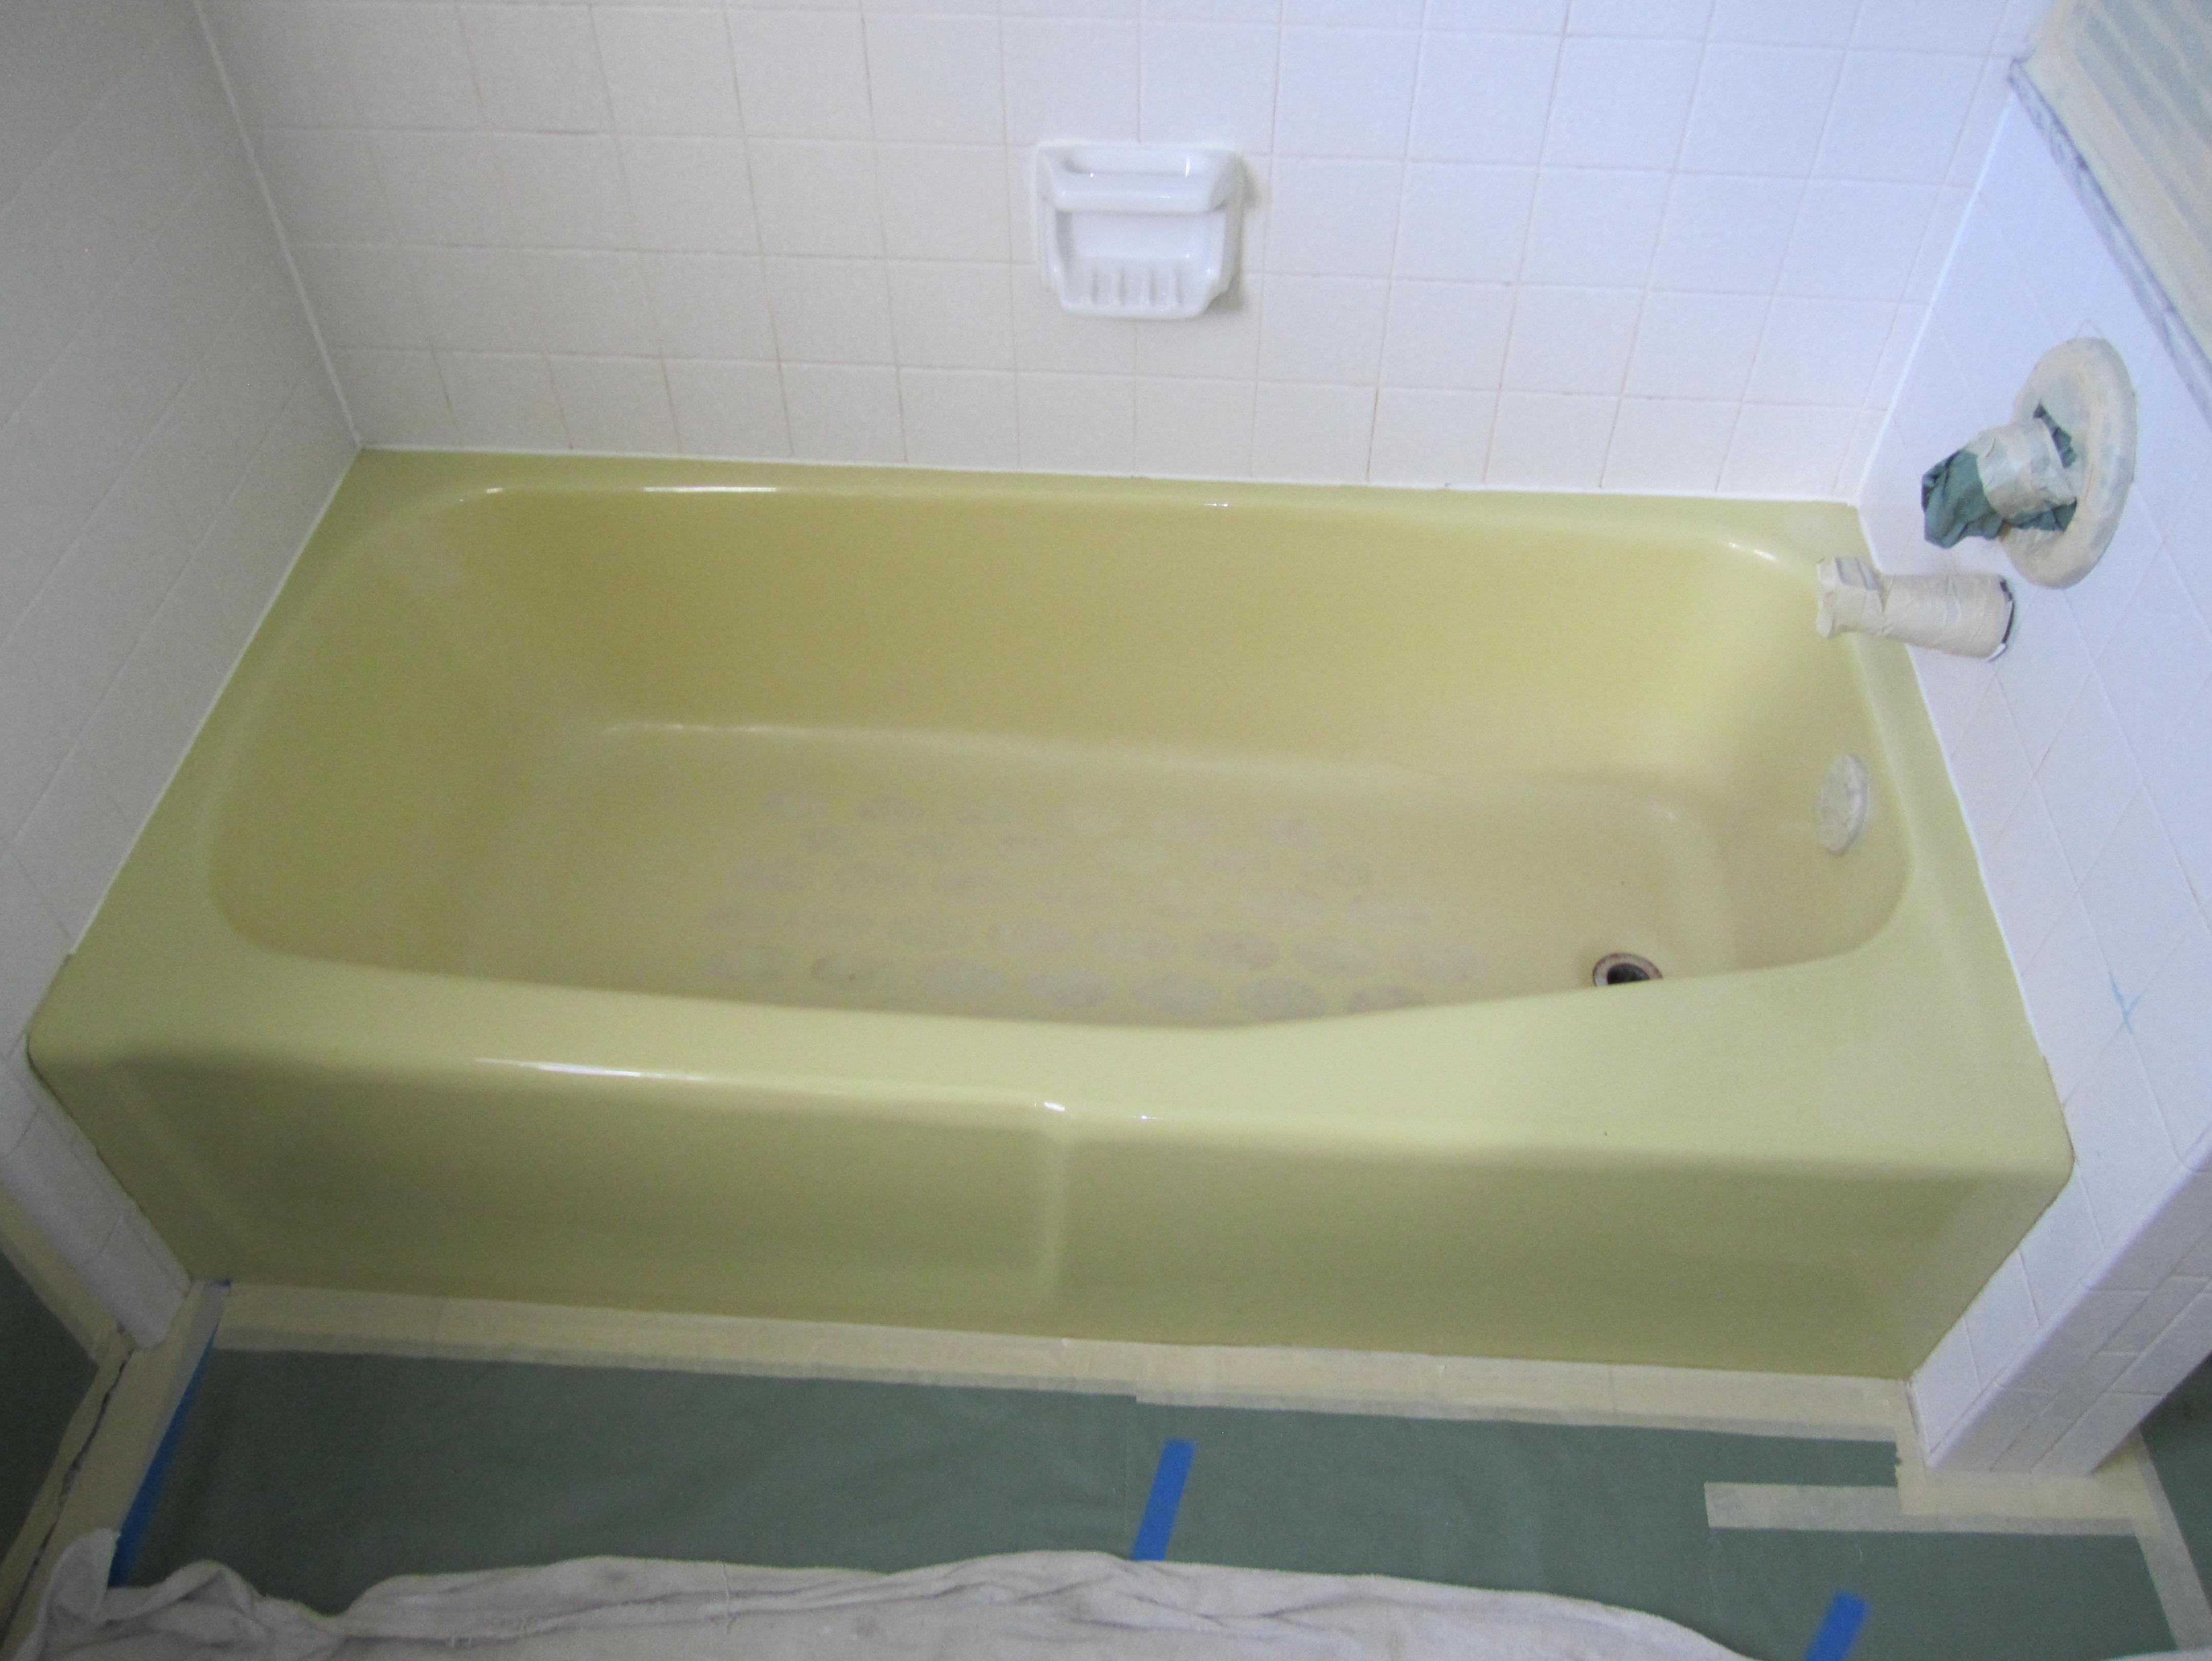 High Quality New Again Tub U0026 Tile Reglazing 1257 Drew St Unit 4 Clearwater, FL Bathtubs  U0026 Sinks Repairing U0026 Refinishing   MapQuest